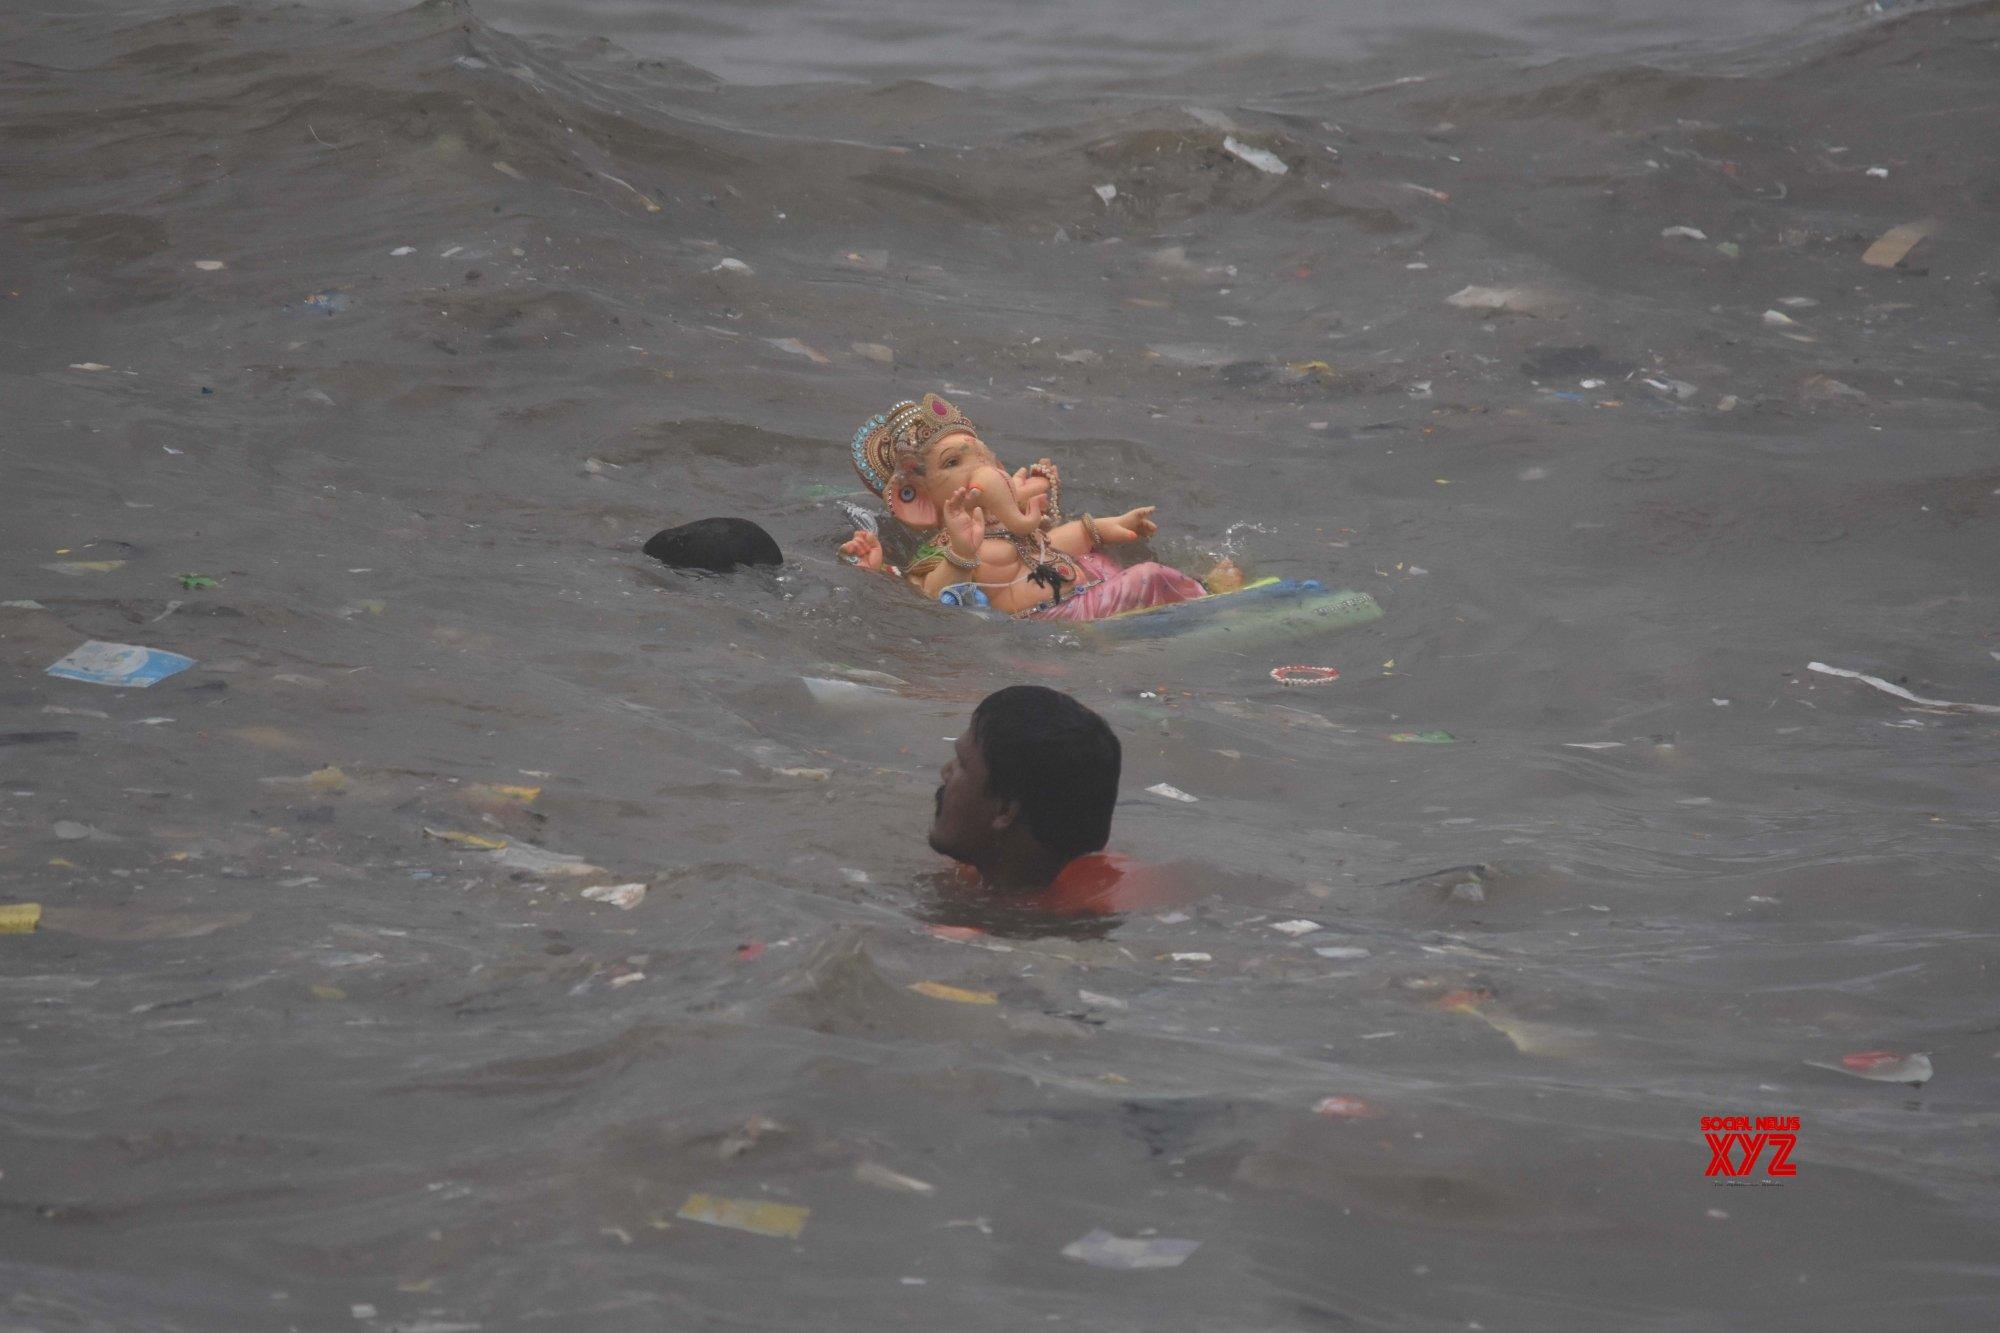 Mumbai: Devotees carrying Gauri and Ganesh idol during immersion at Dadar sea beach in Mumbai. #Gallery